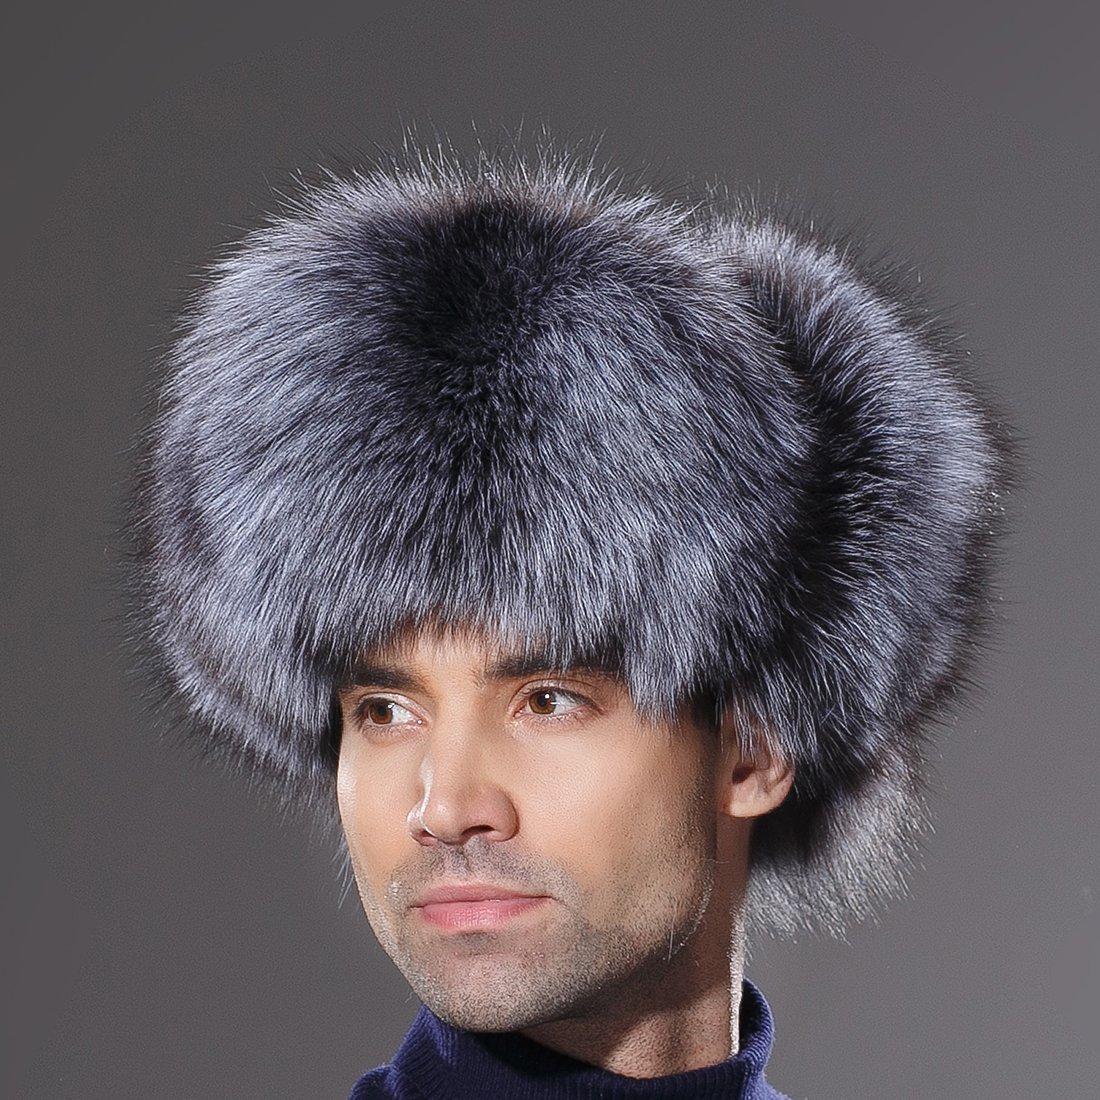 URSFUR Winter Mens Russian Ushanka Hat Real Leather & Silver Fox Fur Trapper Cap by URSFUR (Image #3)